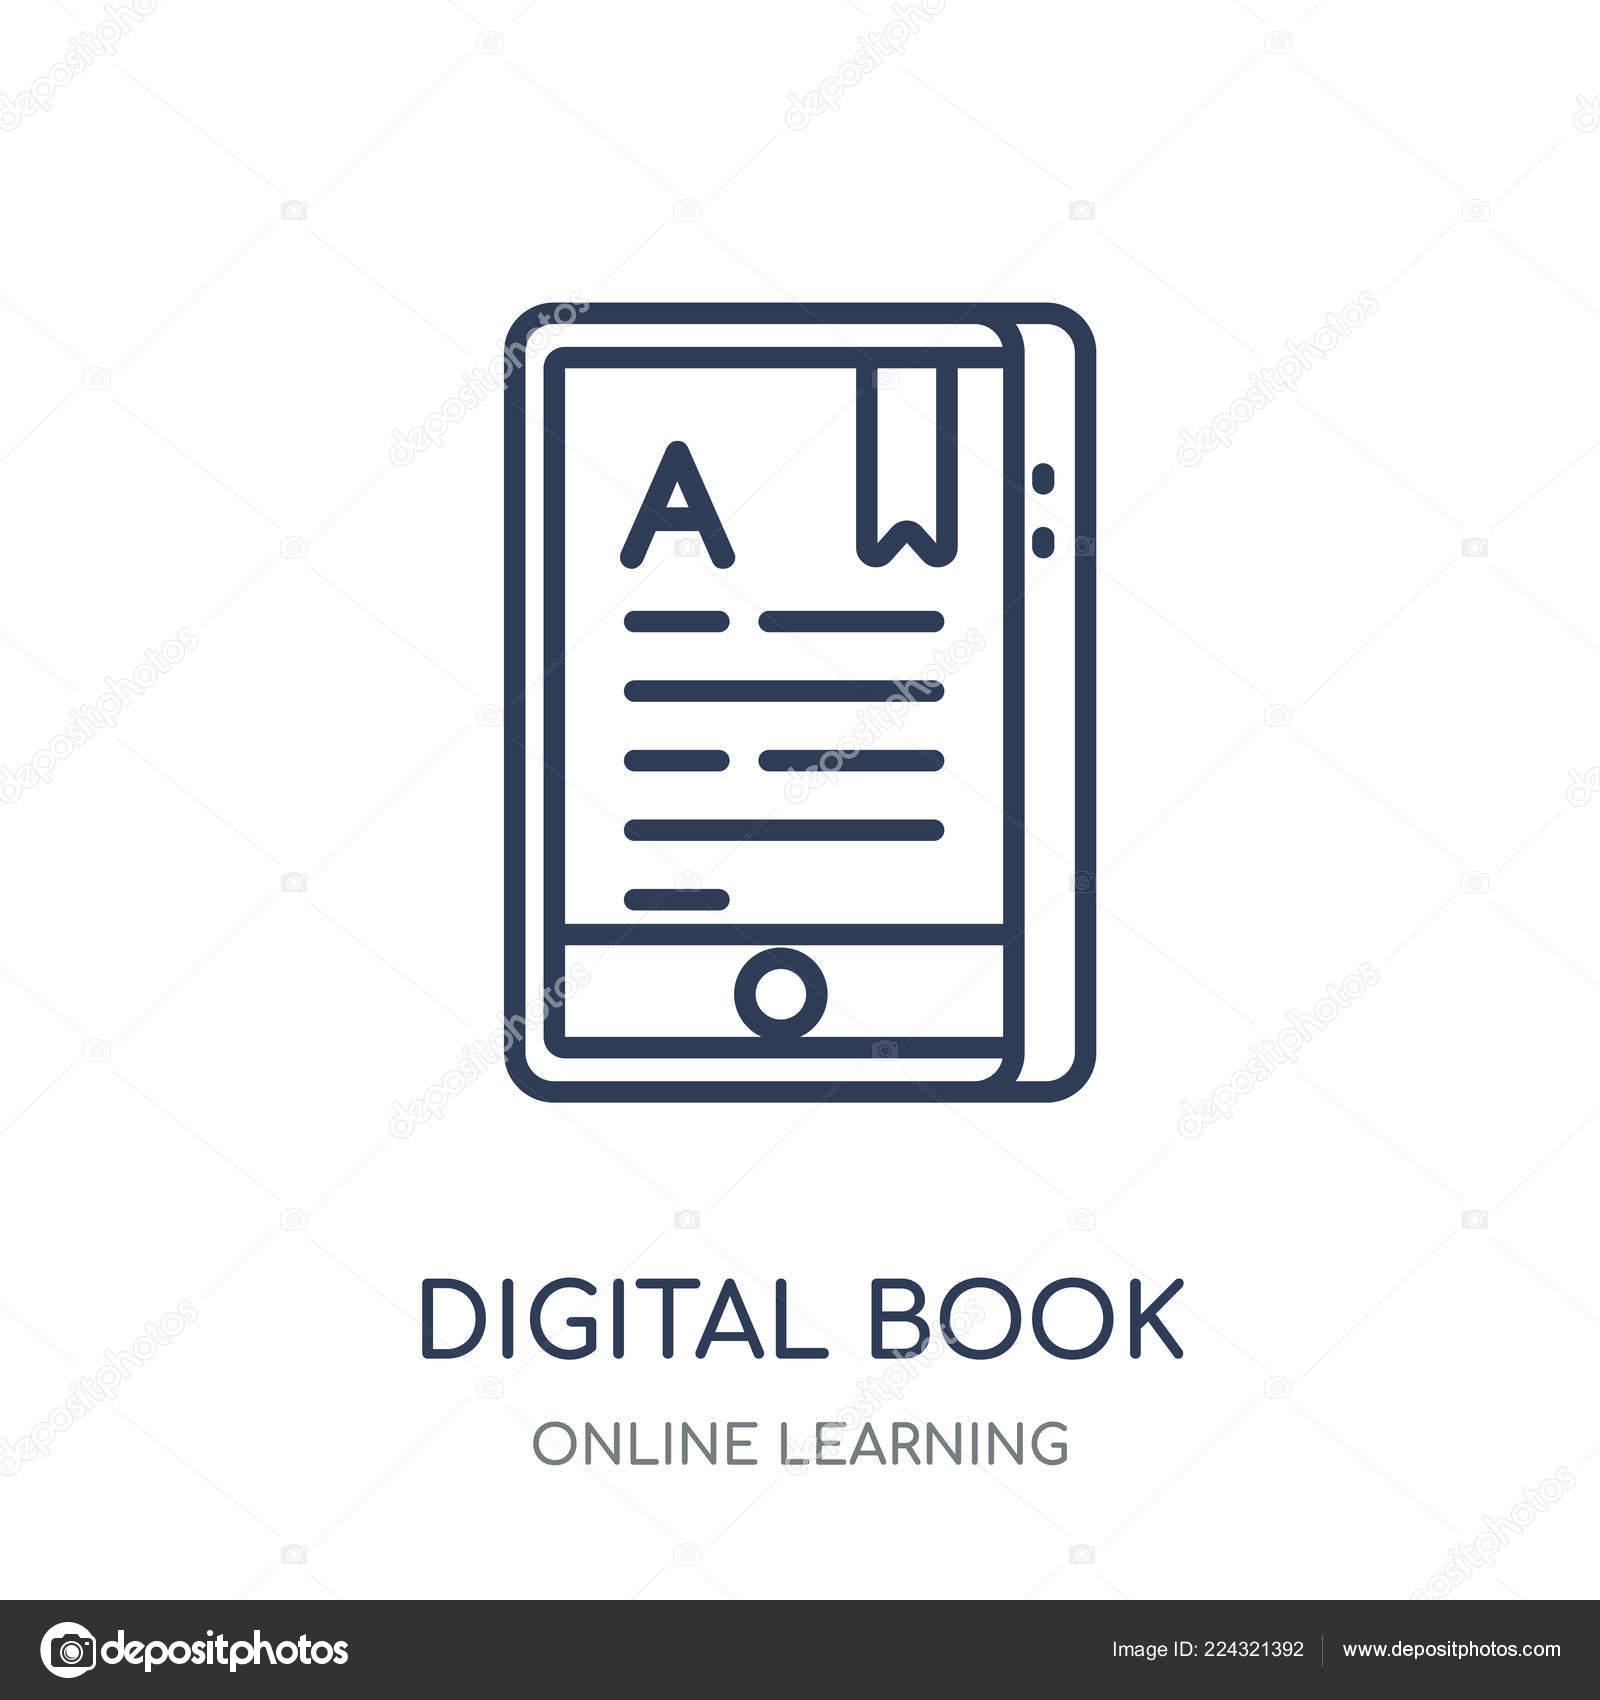 Digital Book Icon Digital Book Linear Symbol Design Online